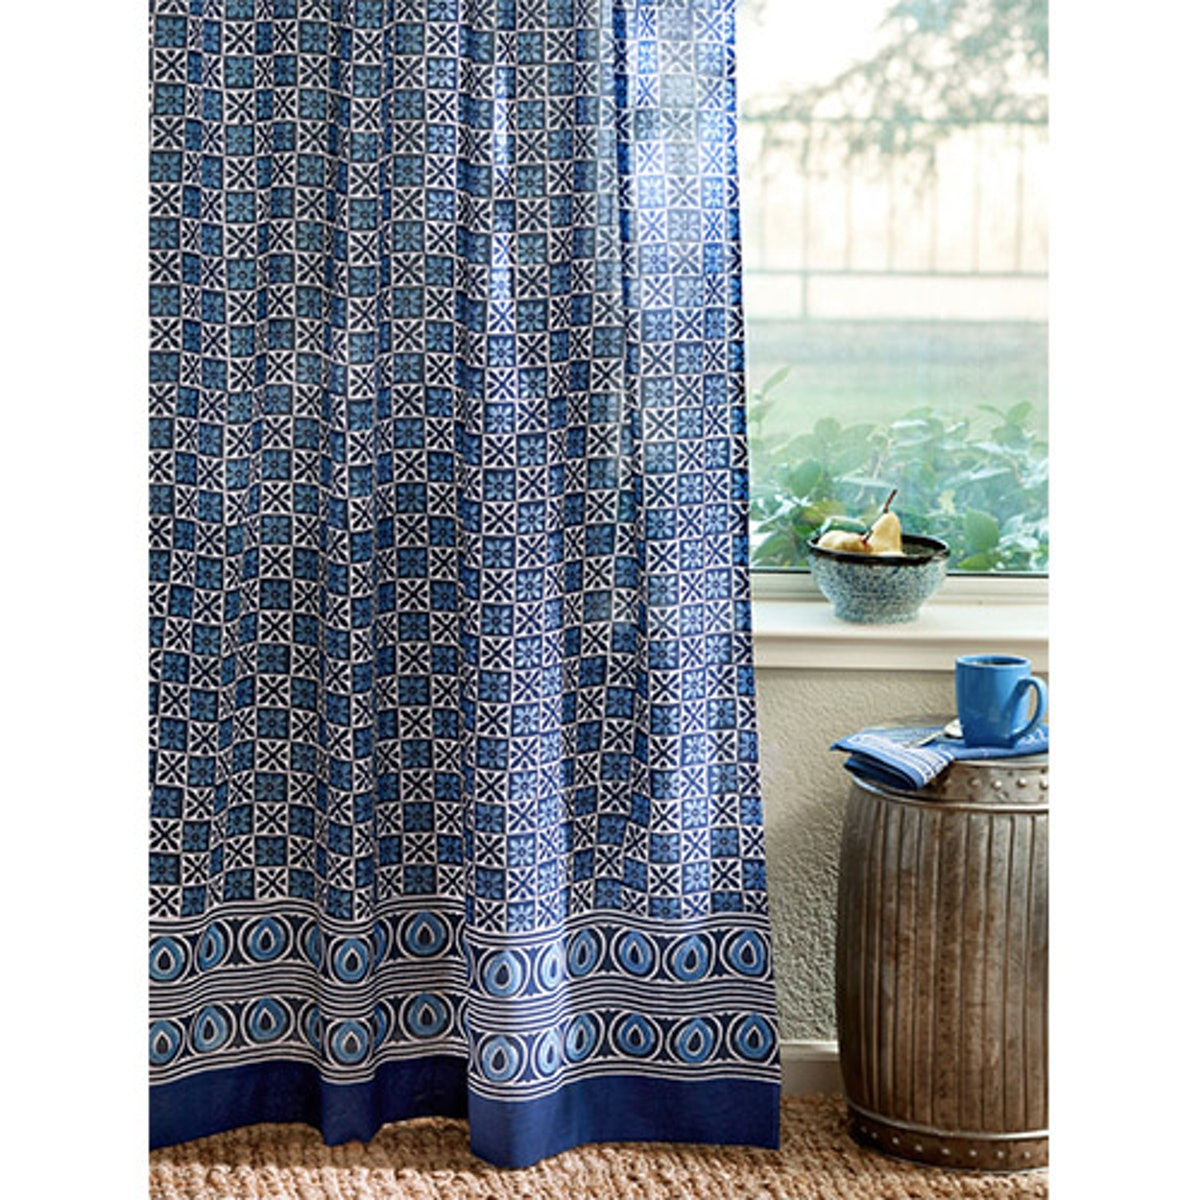 Starry Nights Blue Batik India Sheer Curtain Panel